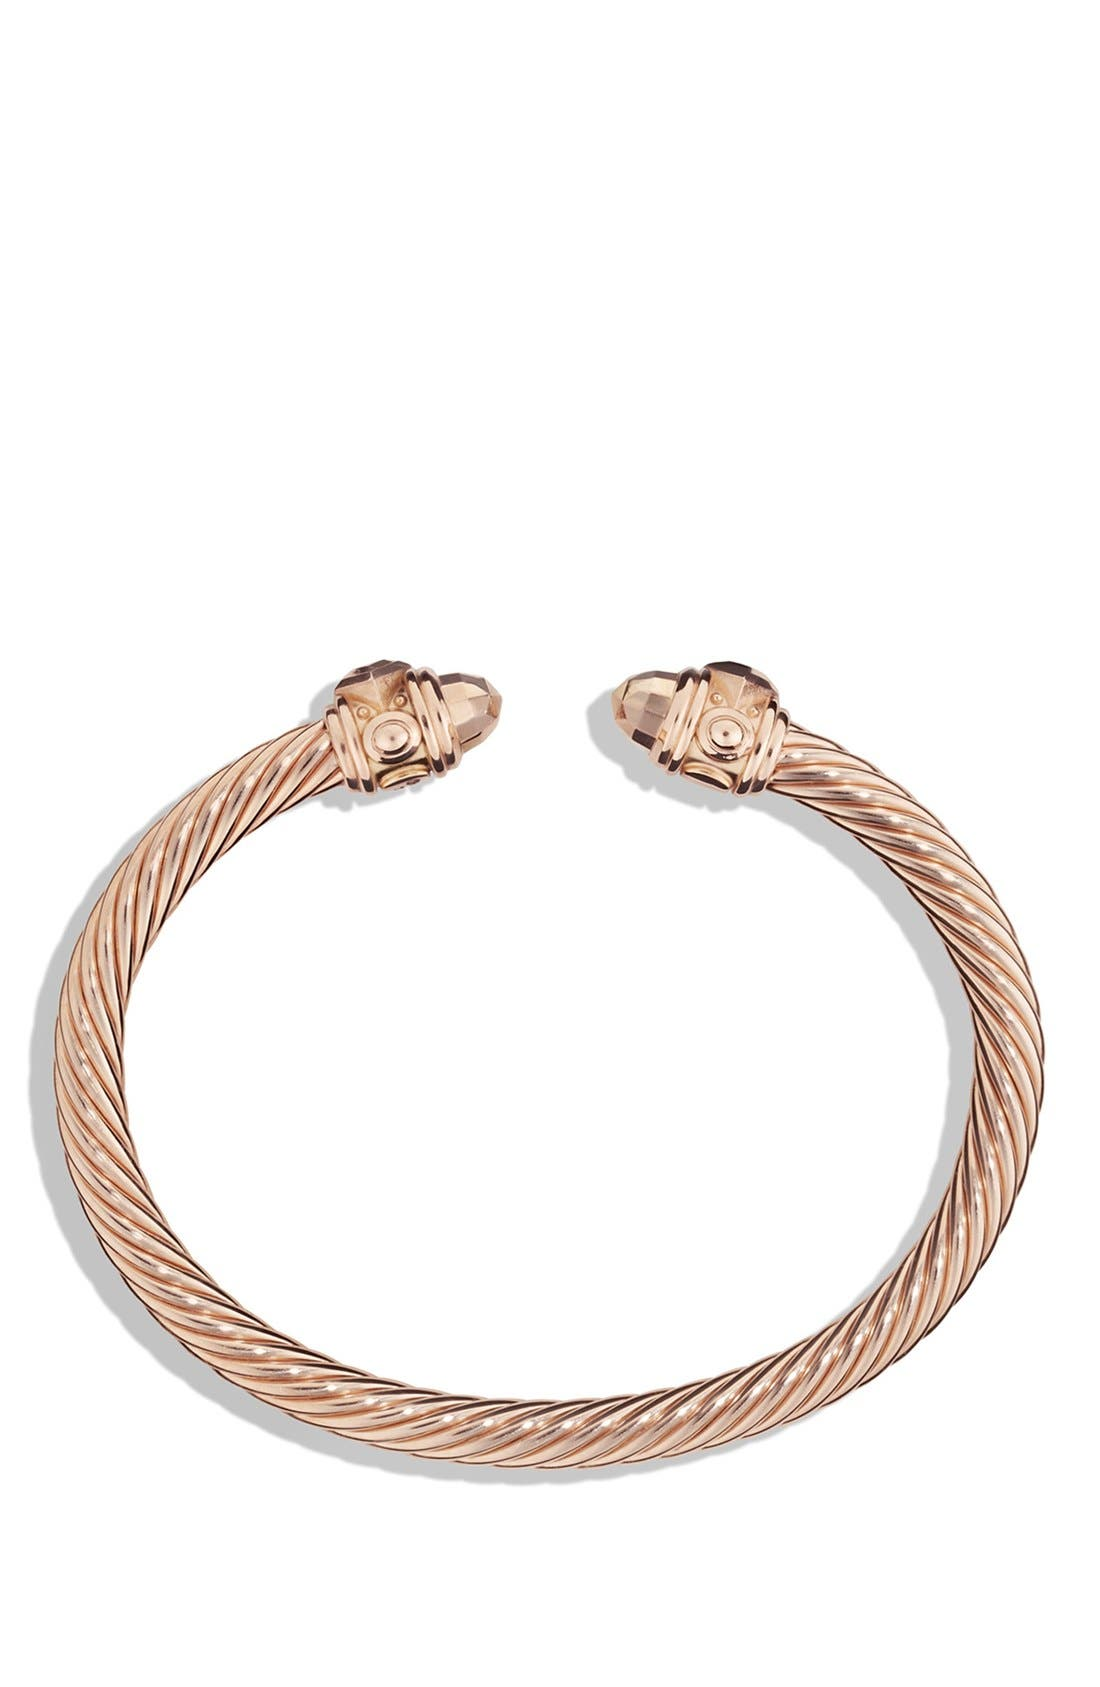 Alternate Image 2  - David Yurman 'Renaissance' Bracelet in Rose Gold